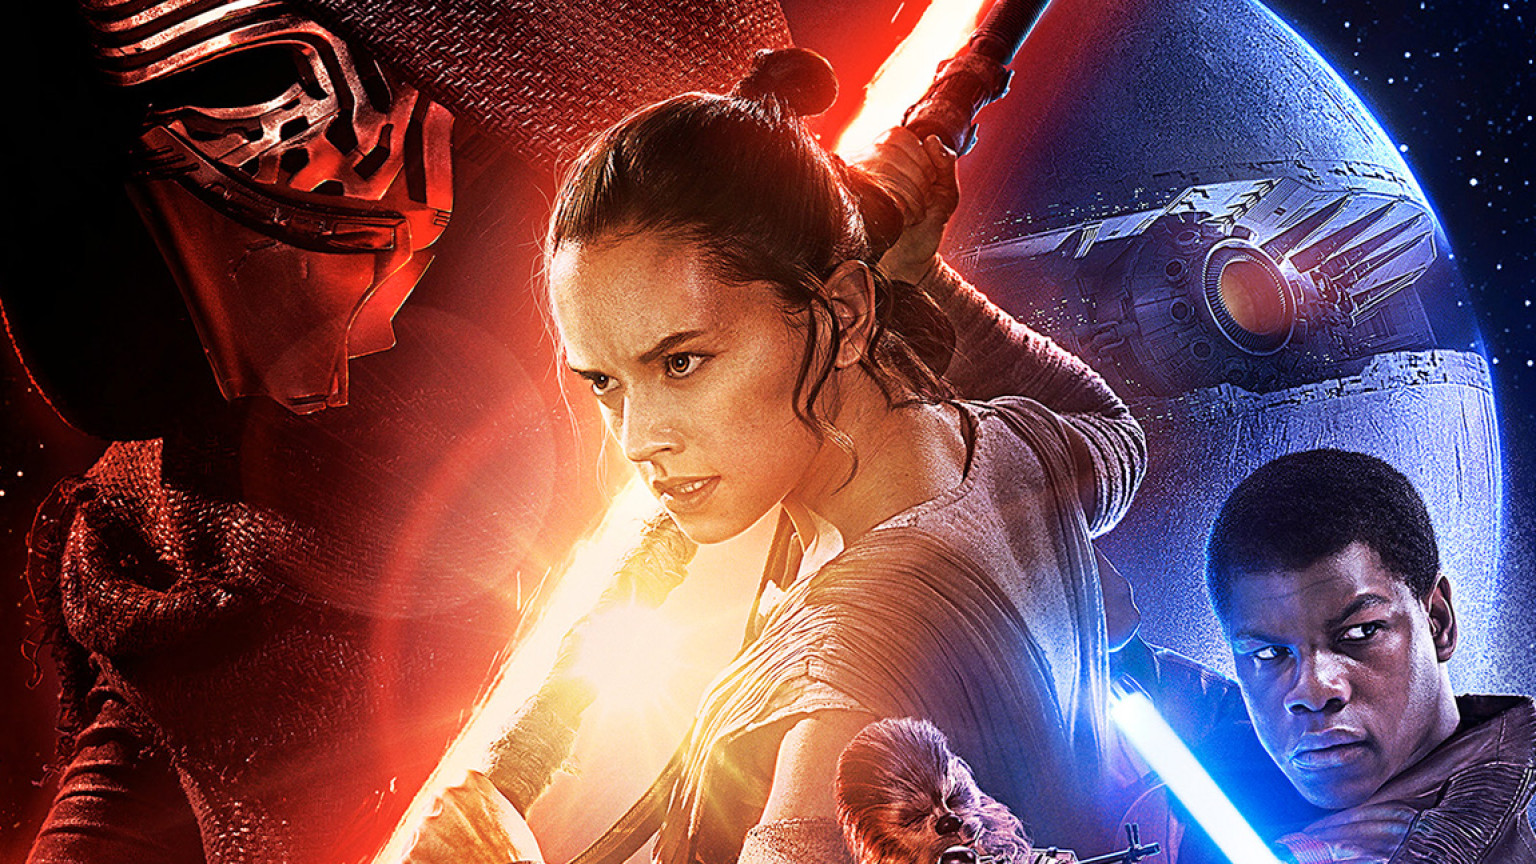 star-wars-force-awakens-official-poster-1536x864-336534116929.jpg